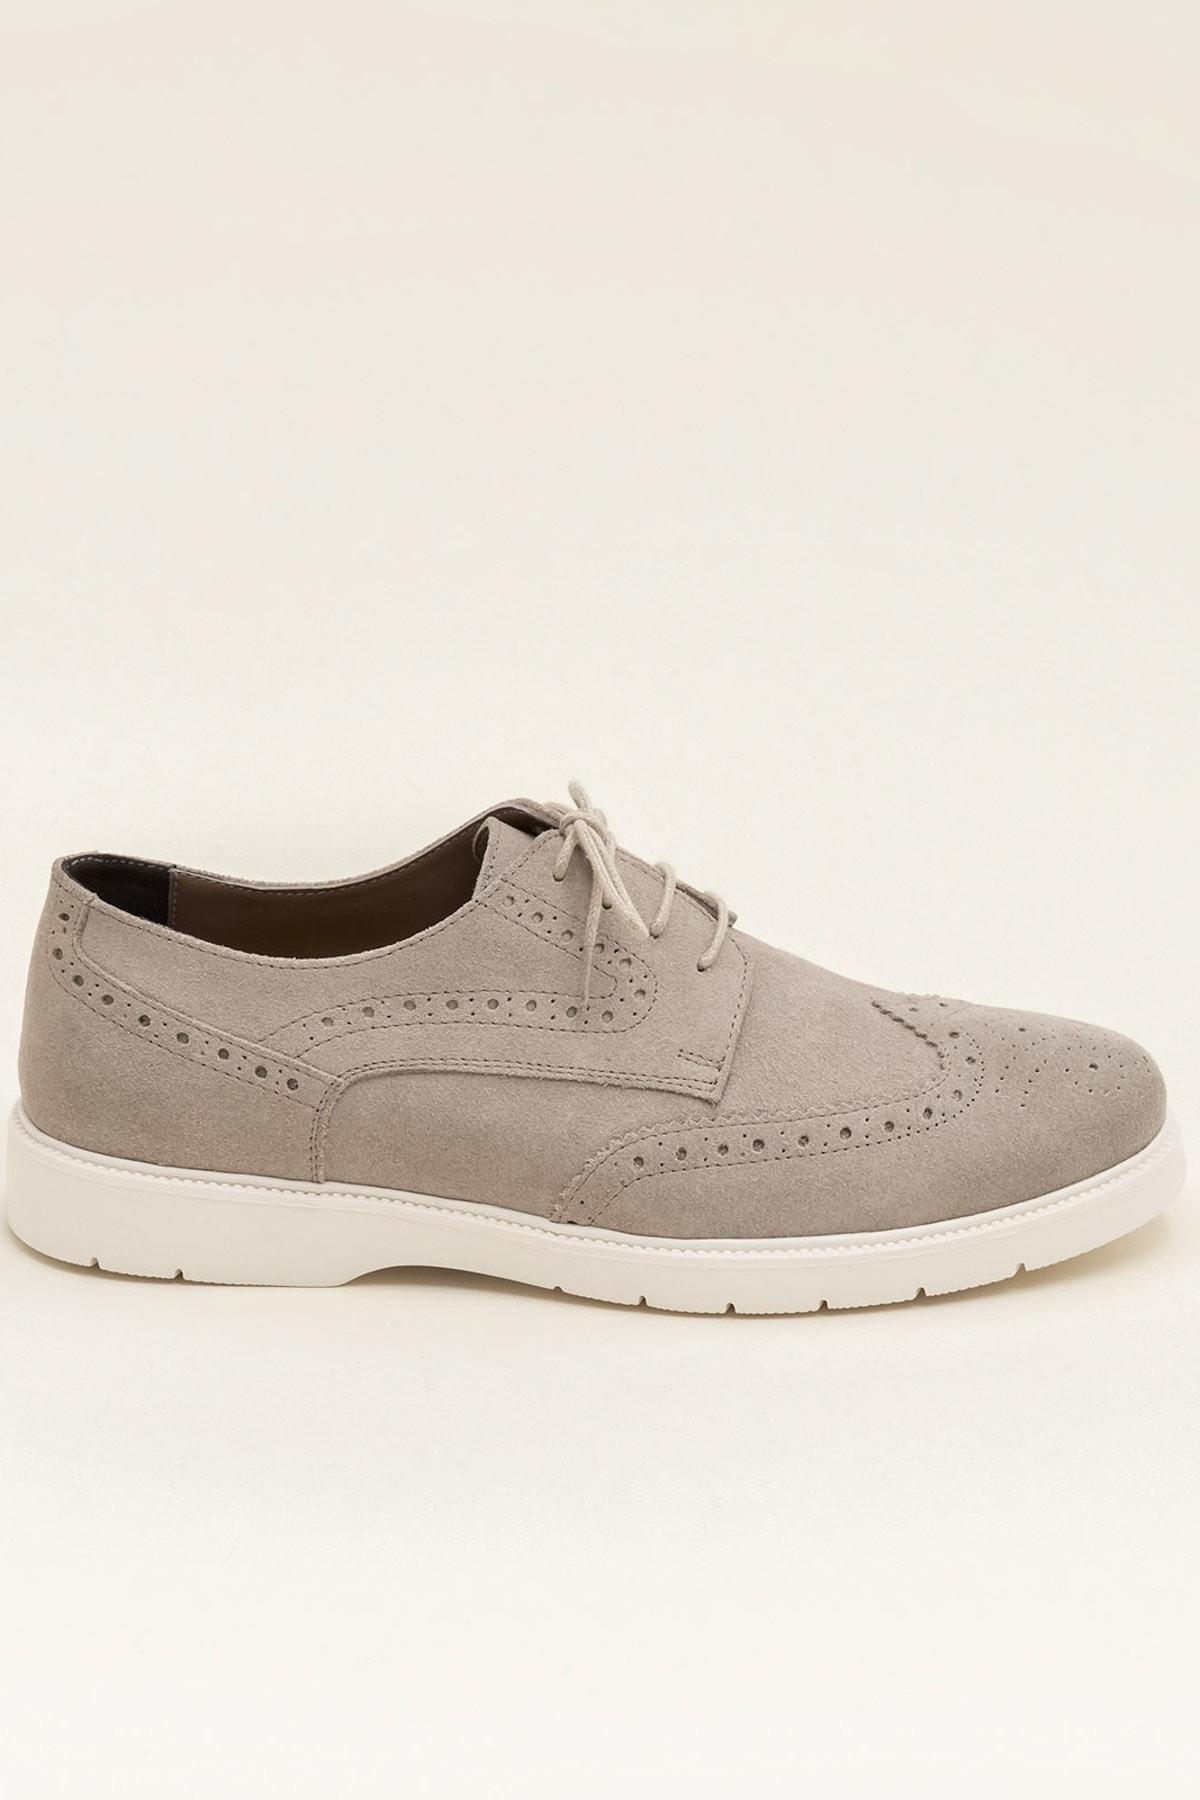 Elle Shoes AMBROSE Bej Erkek Ayakkabı 2